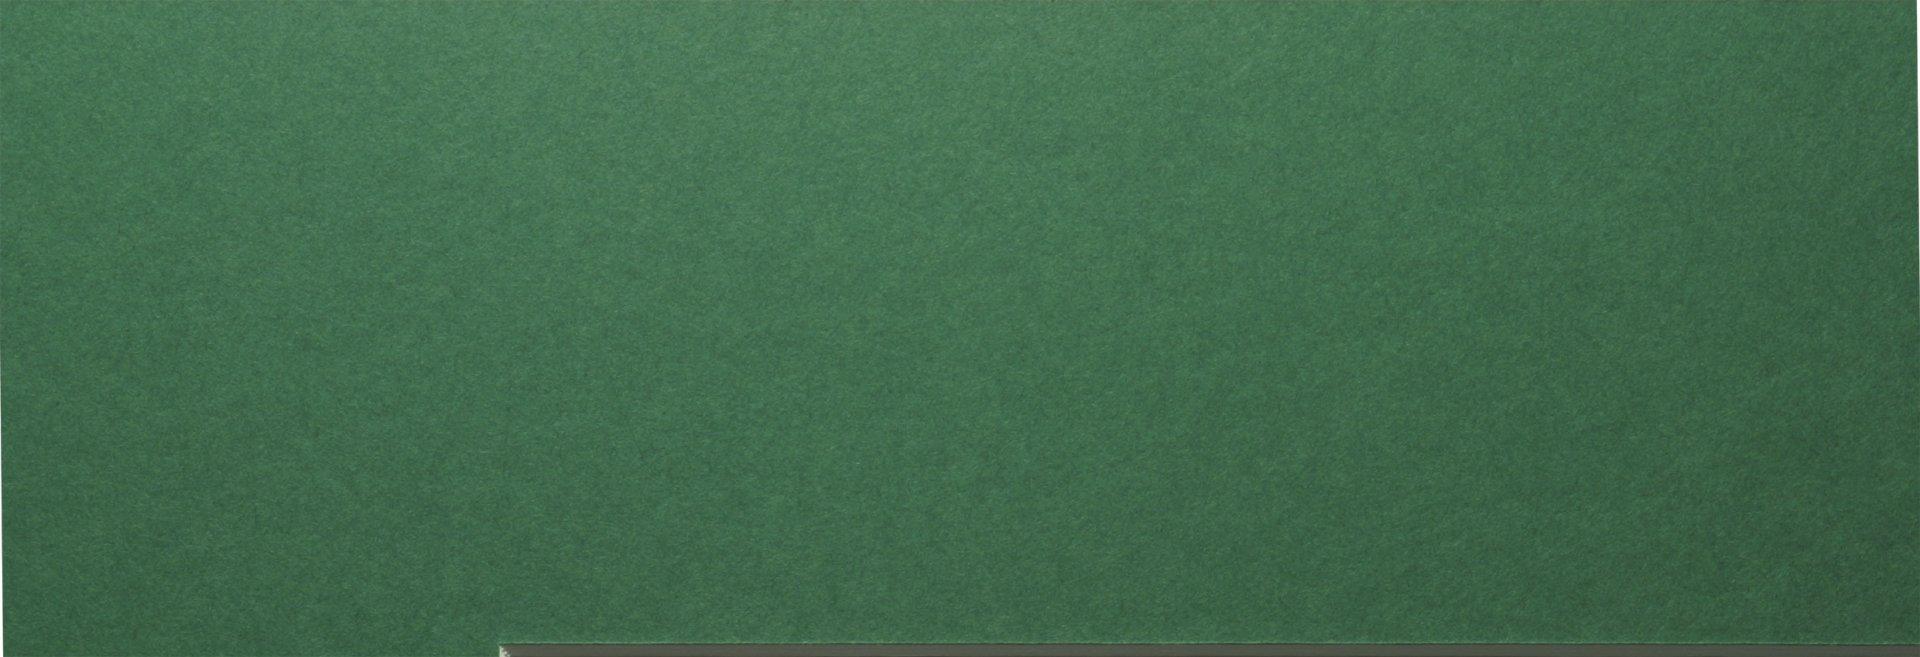 SRM919 Ivy Green